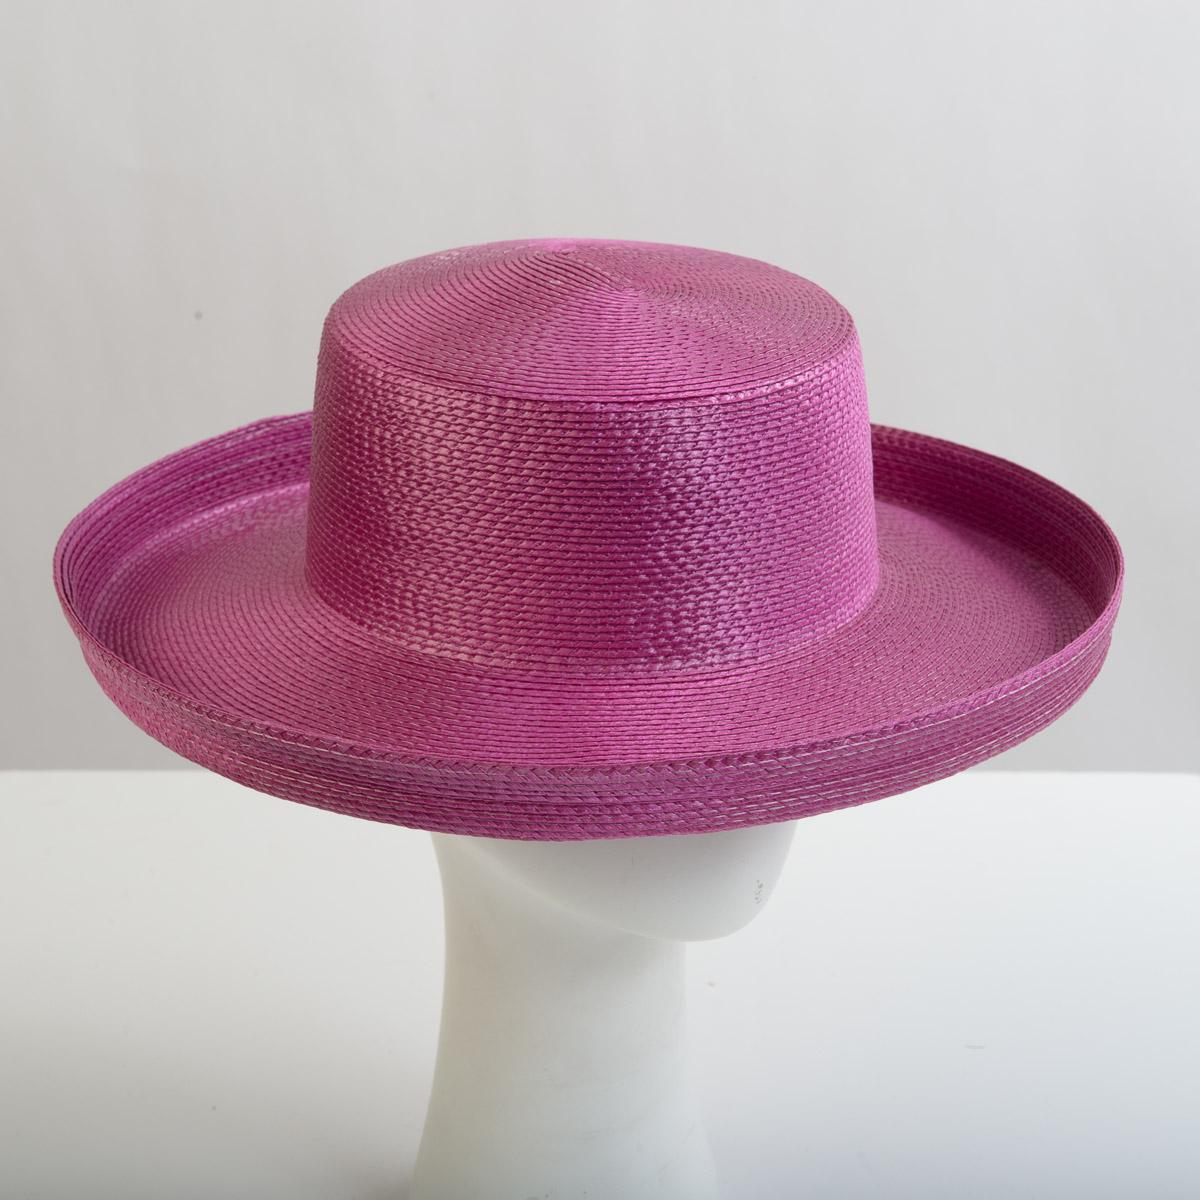 2deb2c5e0fd66a White Polypropylene Straw Medium Brim Plain Hats-CH-188009-47- Sun Yorkos |  Zoria